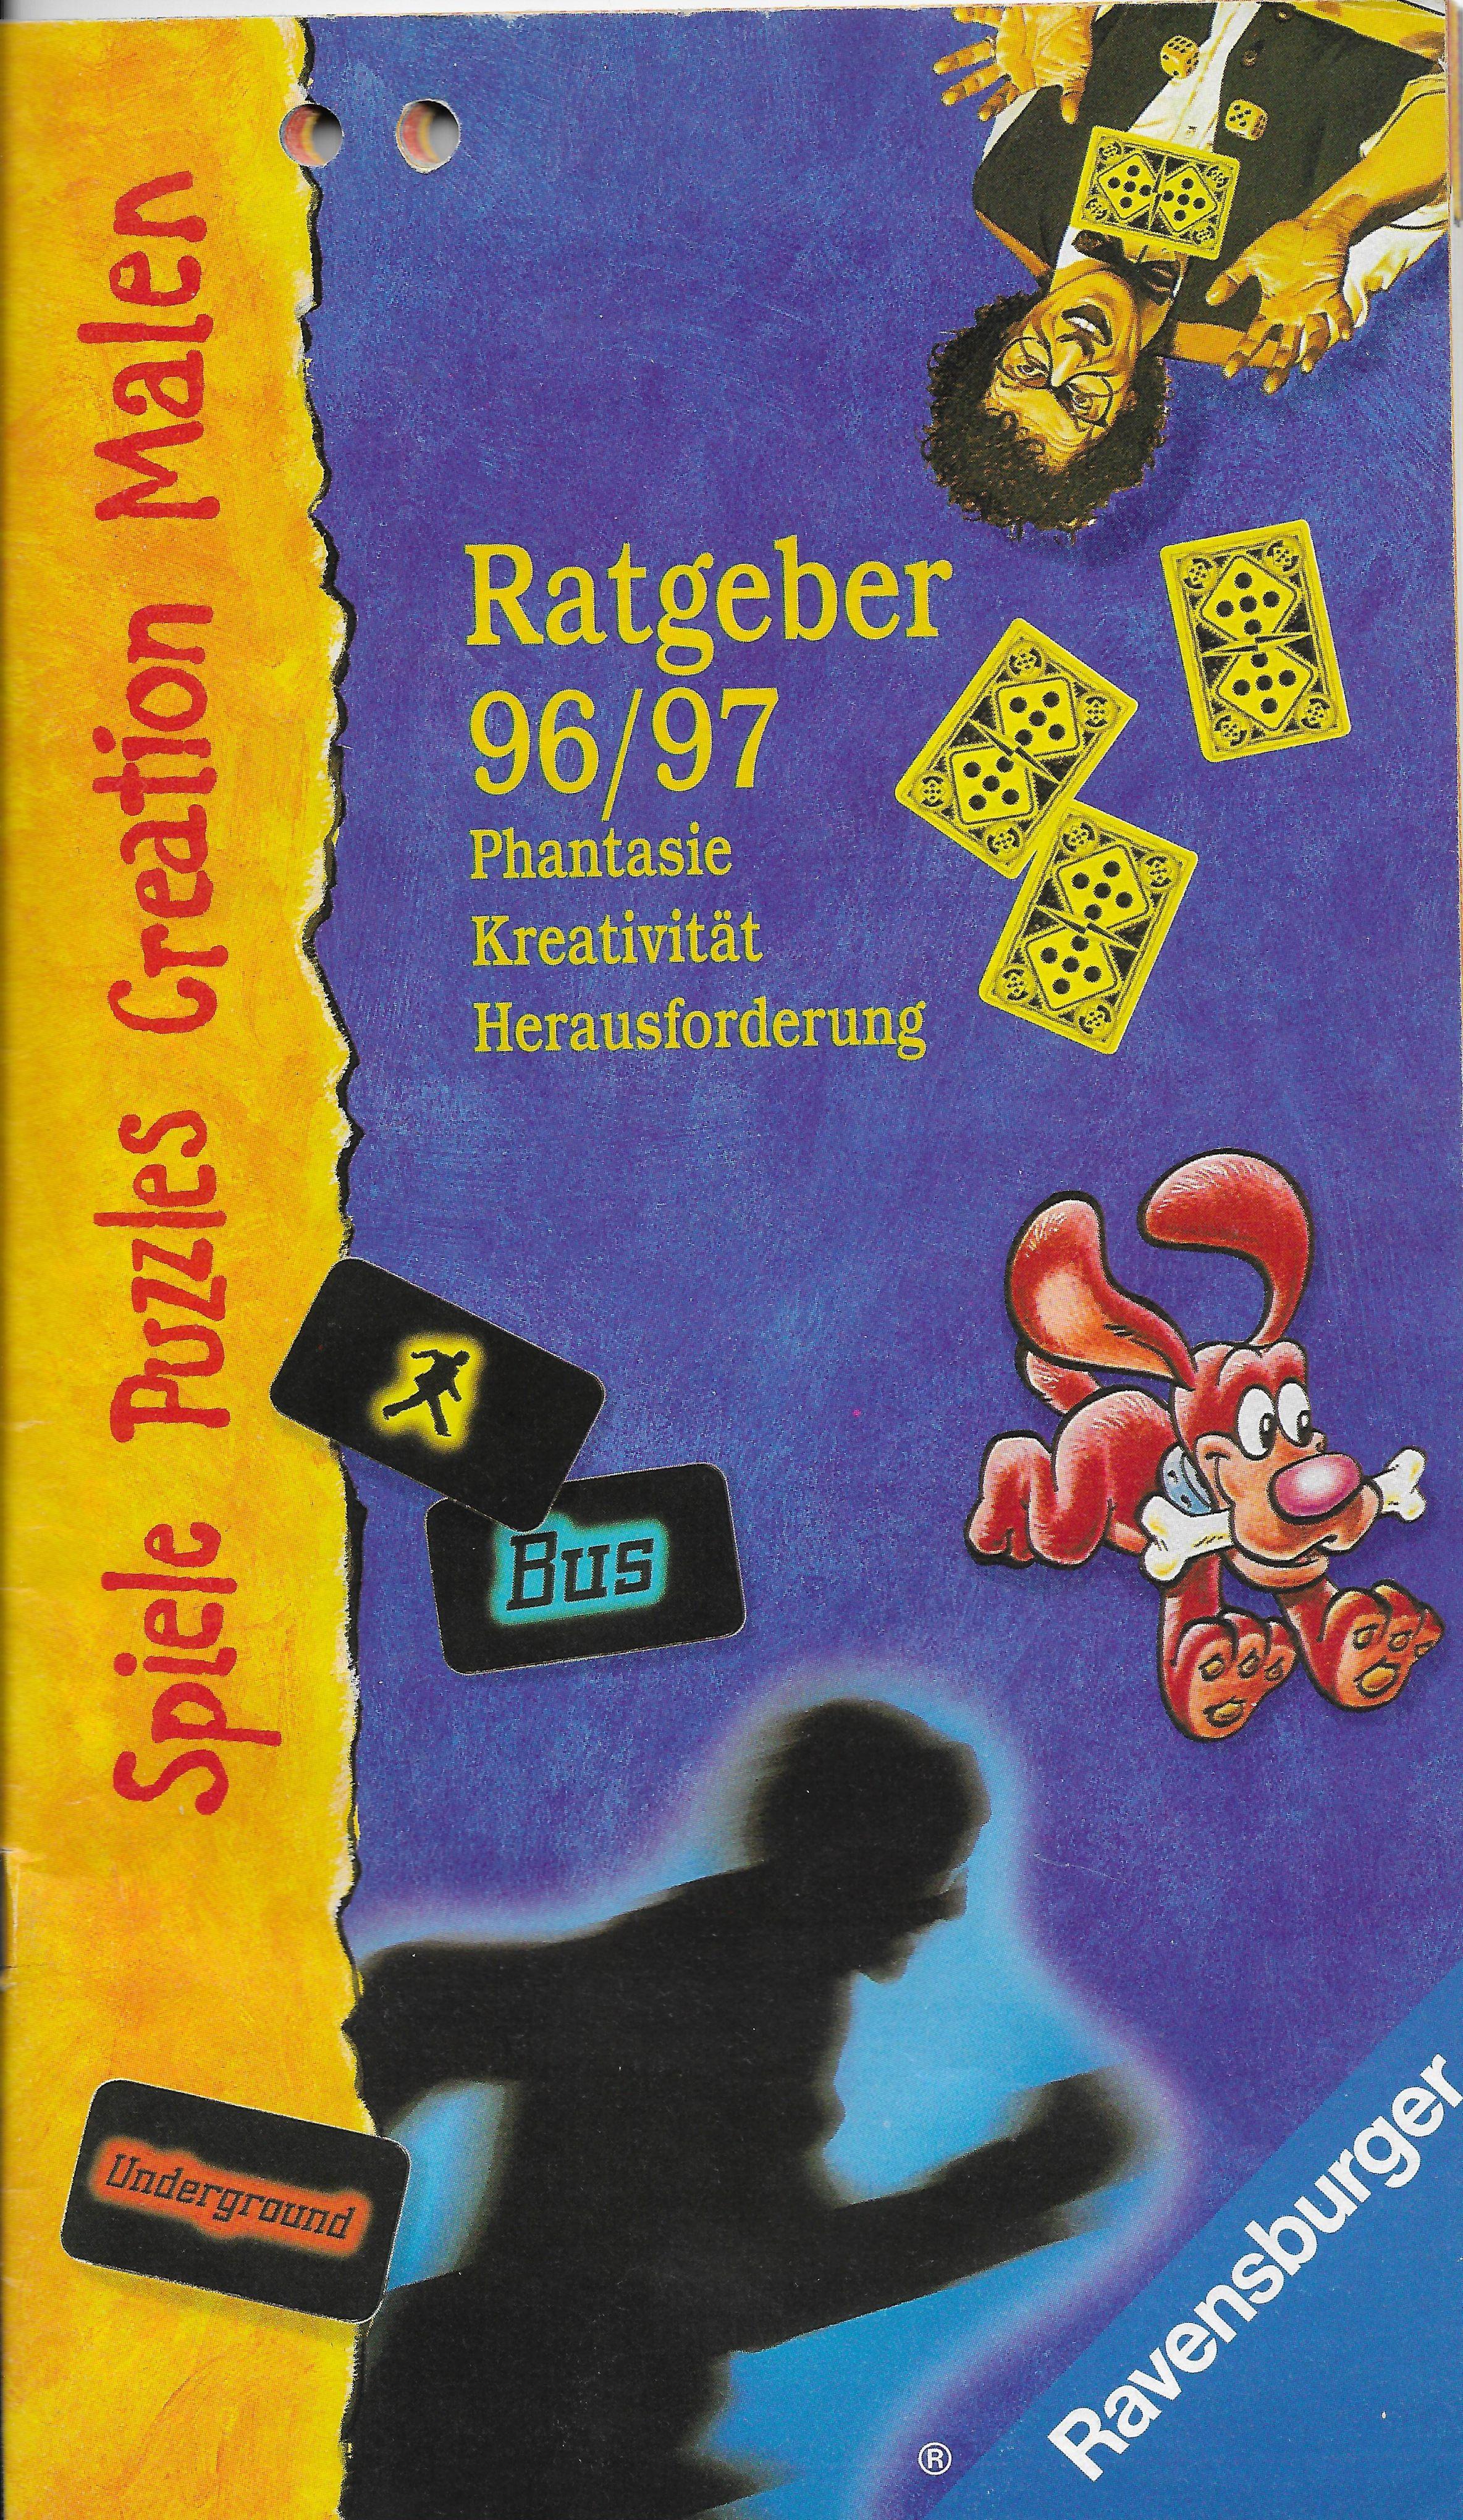 1996-os Ravensburger katalógus